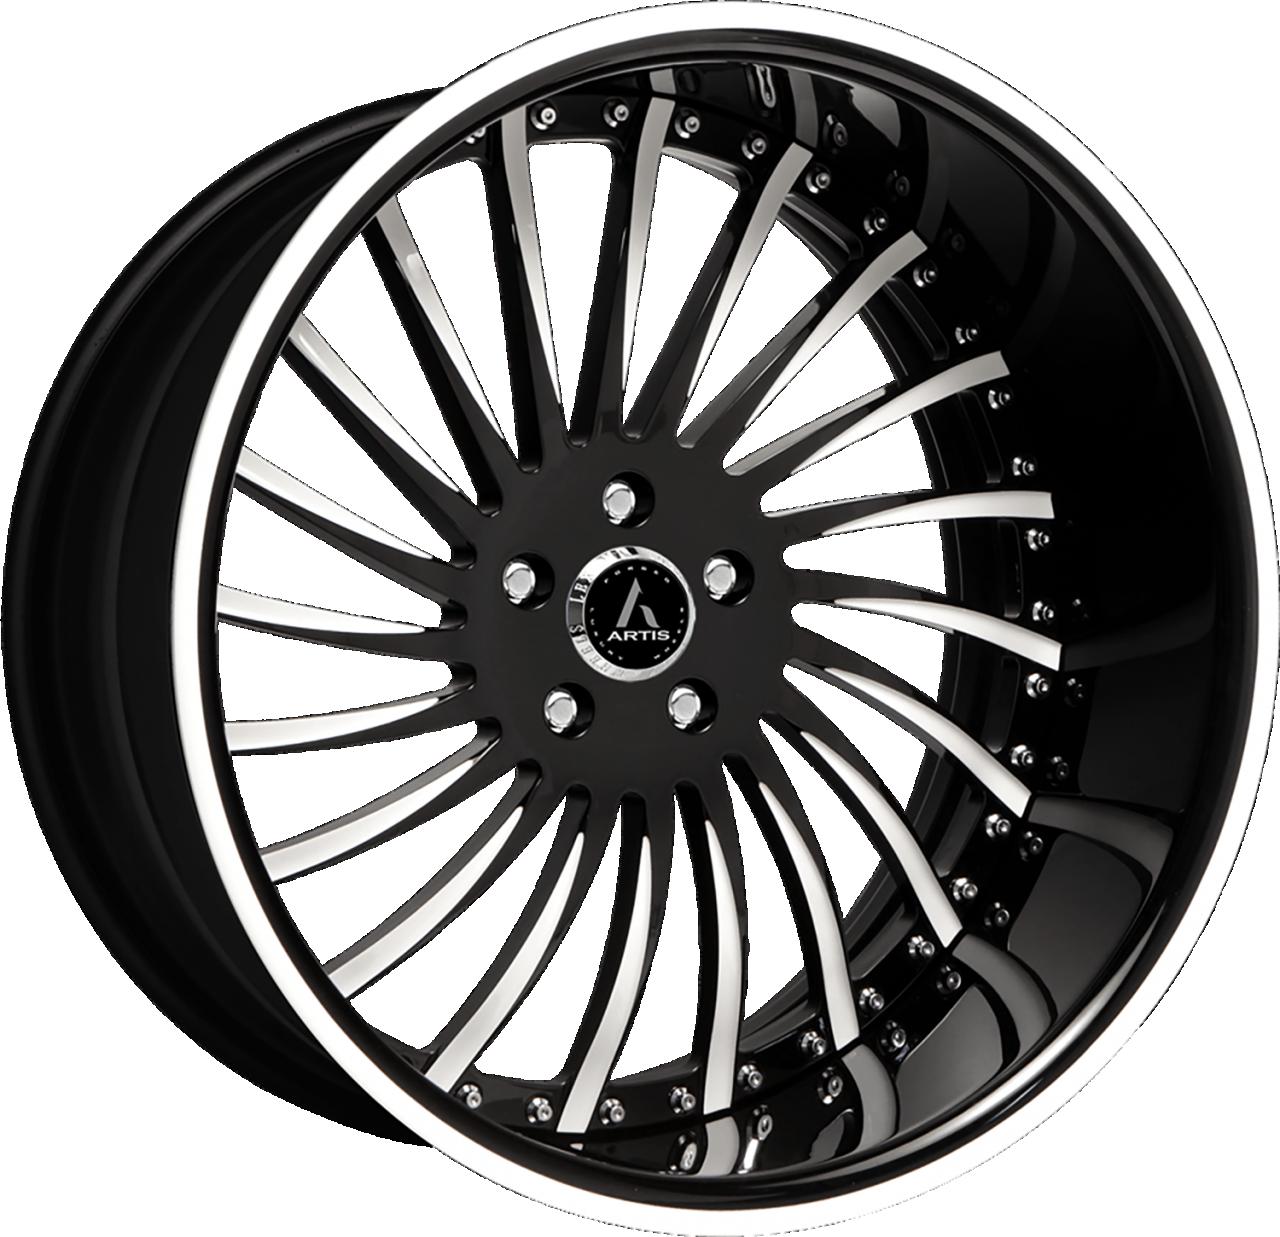 Artis Forged International wheel with Custom finish